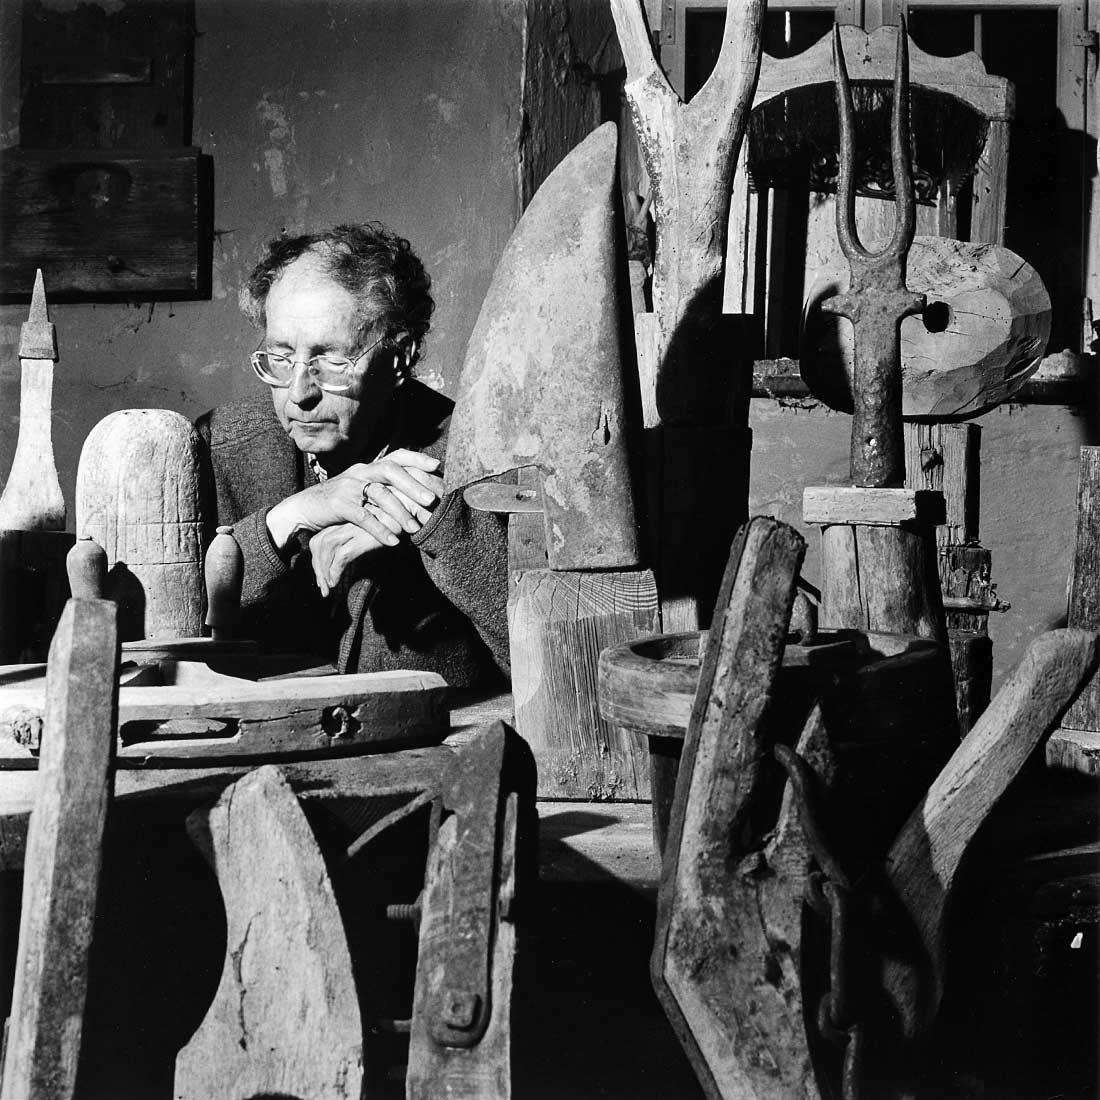 Walter Zacharias